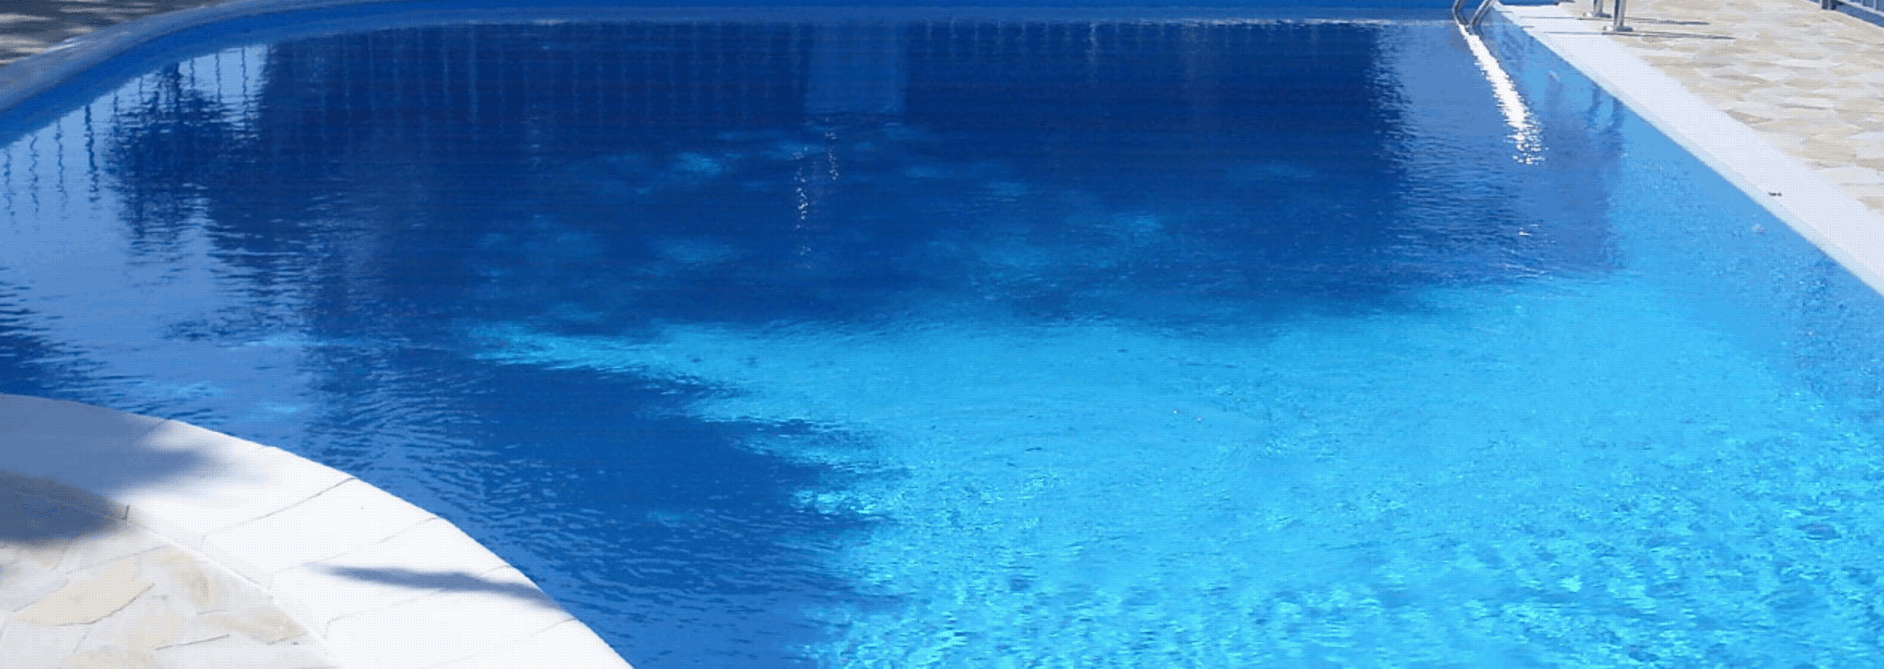 acqua limpida di una piscina